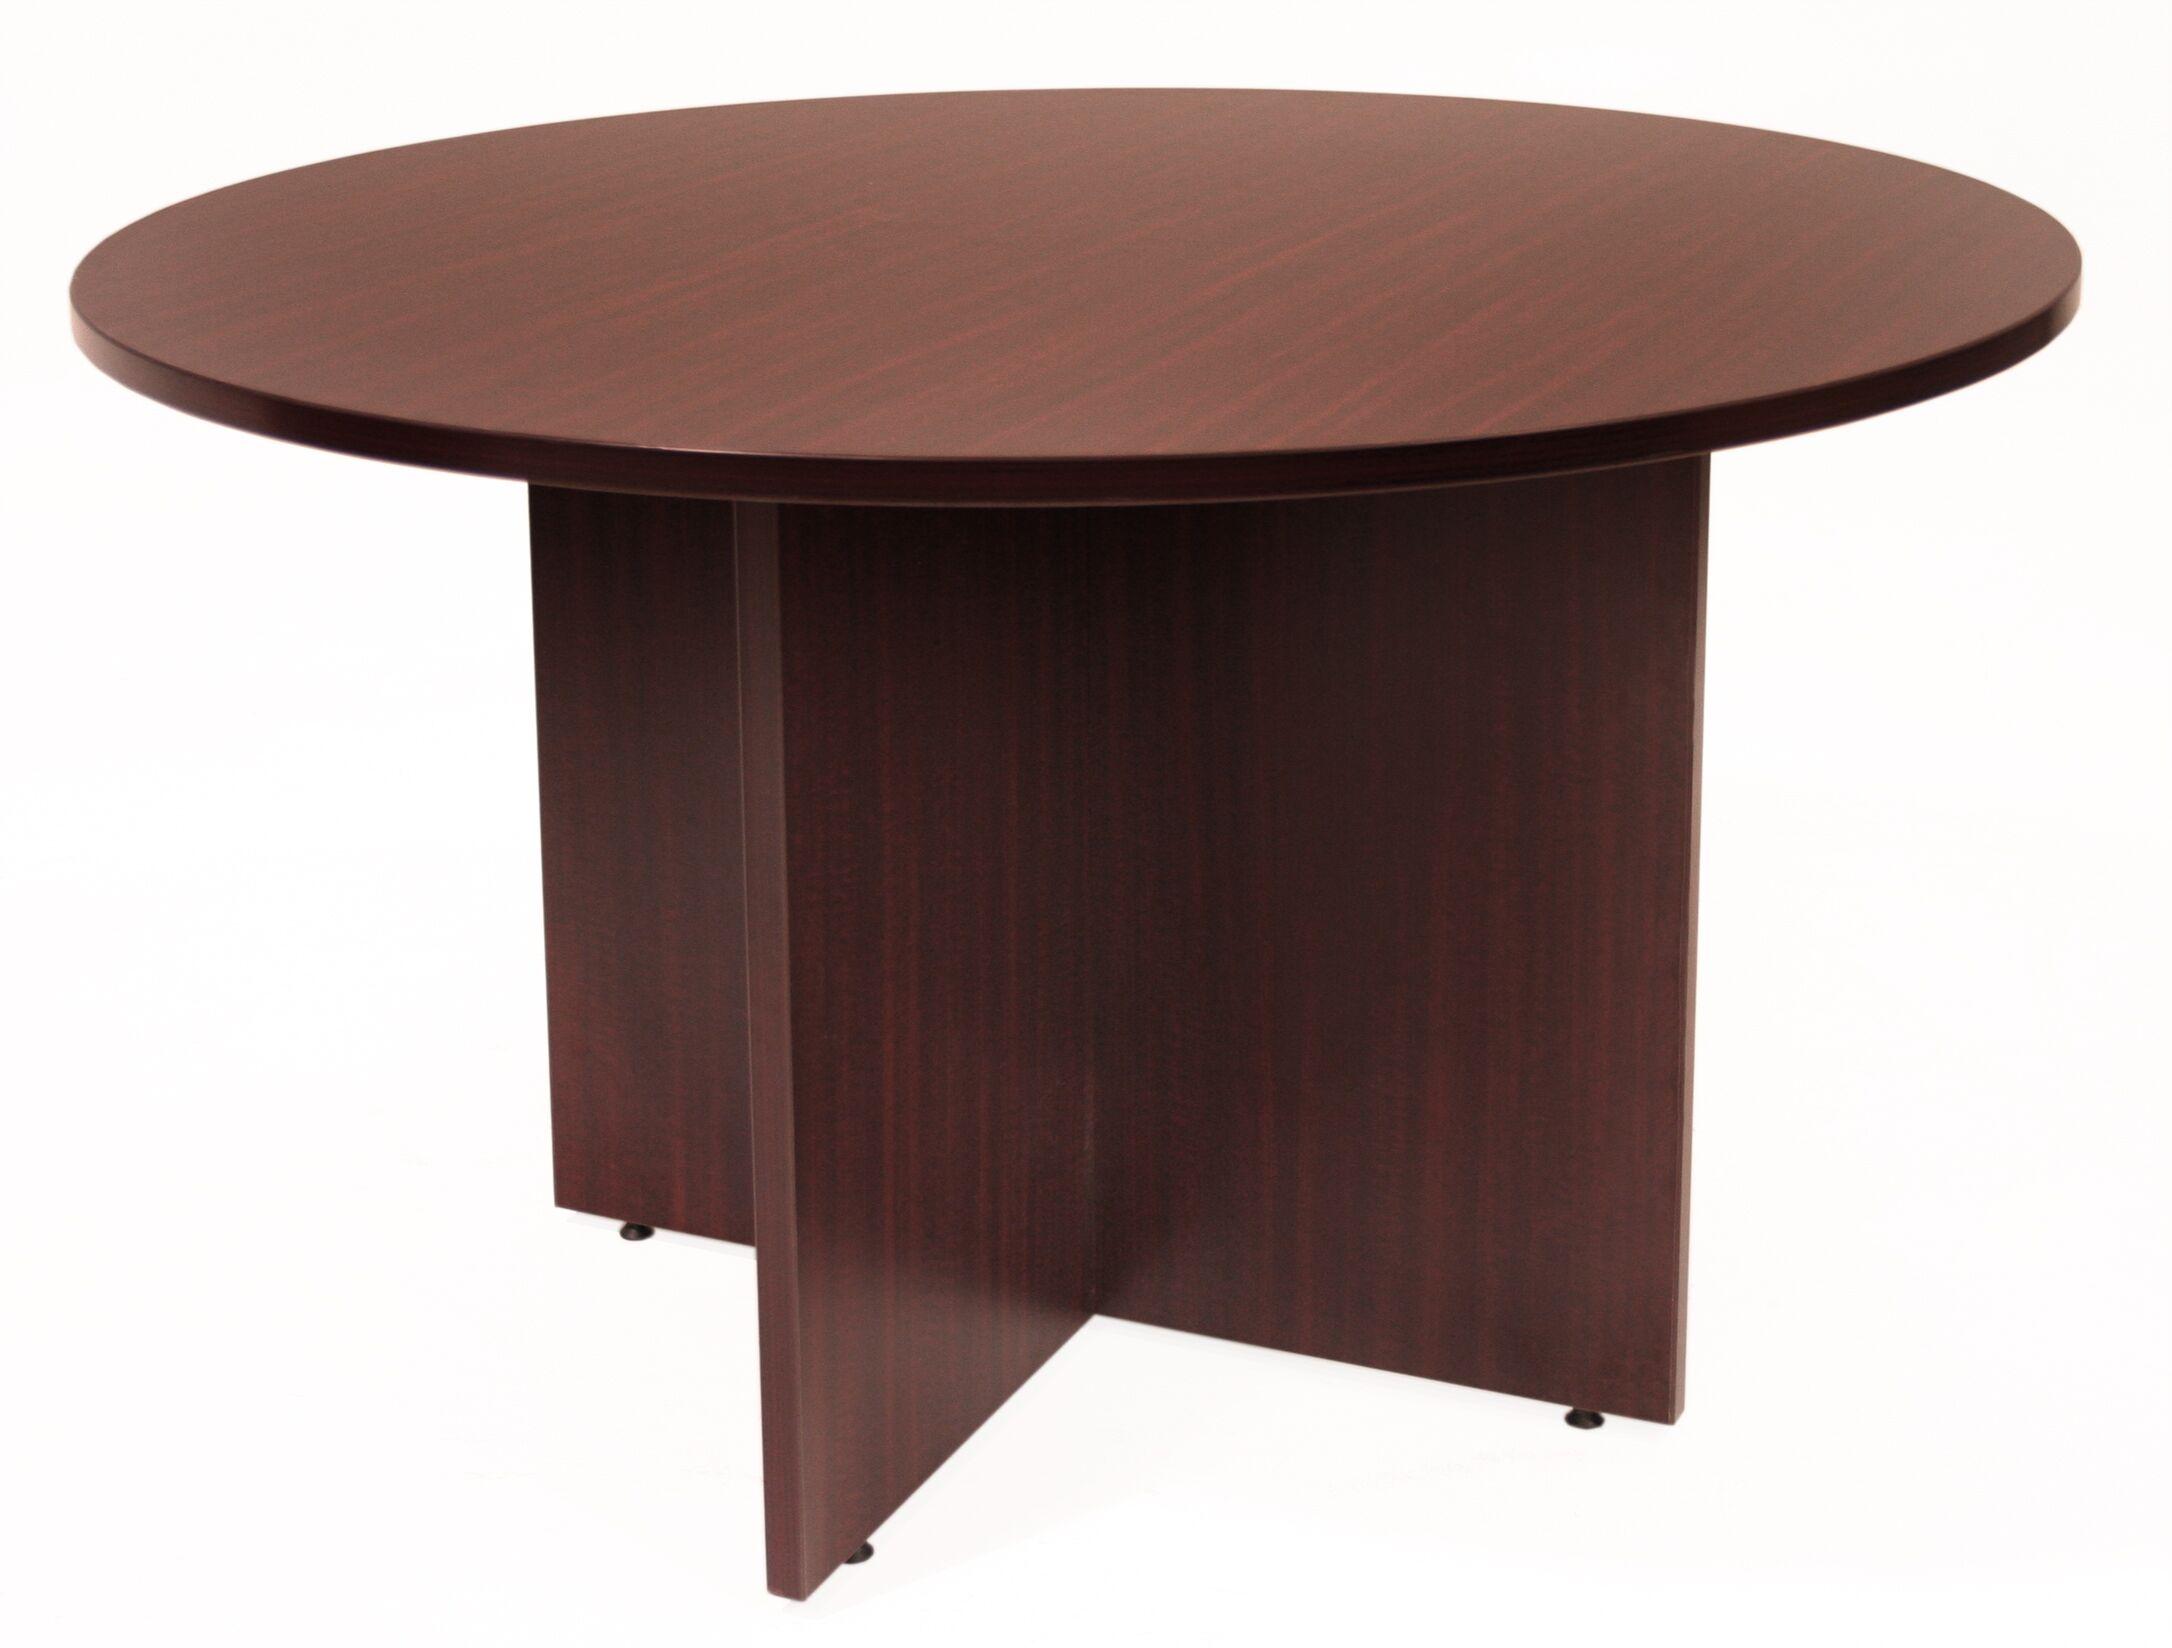 Legacy Circular Conference Table Size: 4' L Diameter, Finish: Mahogany